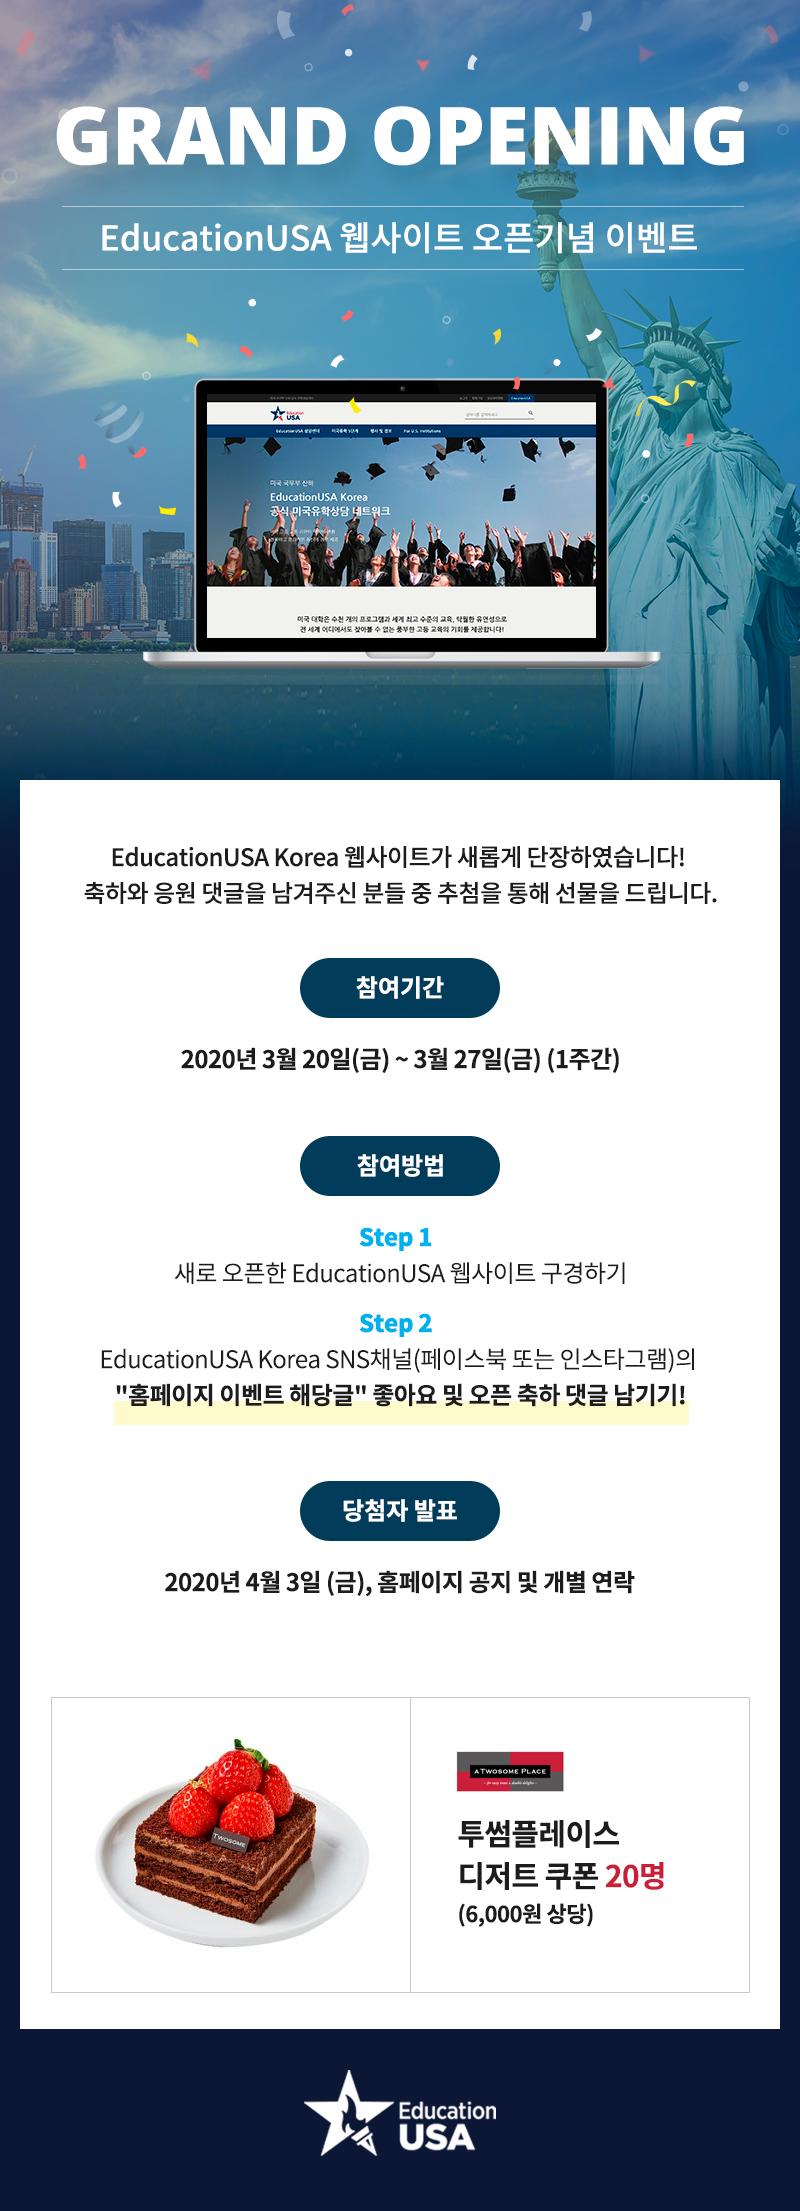 EducationUSA Korea 웹사이트 오픈 이벤트